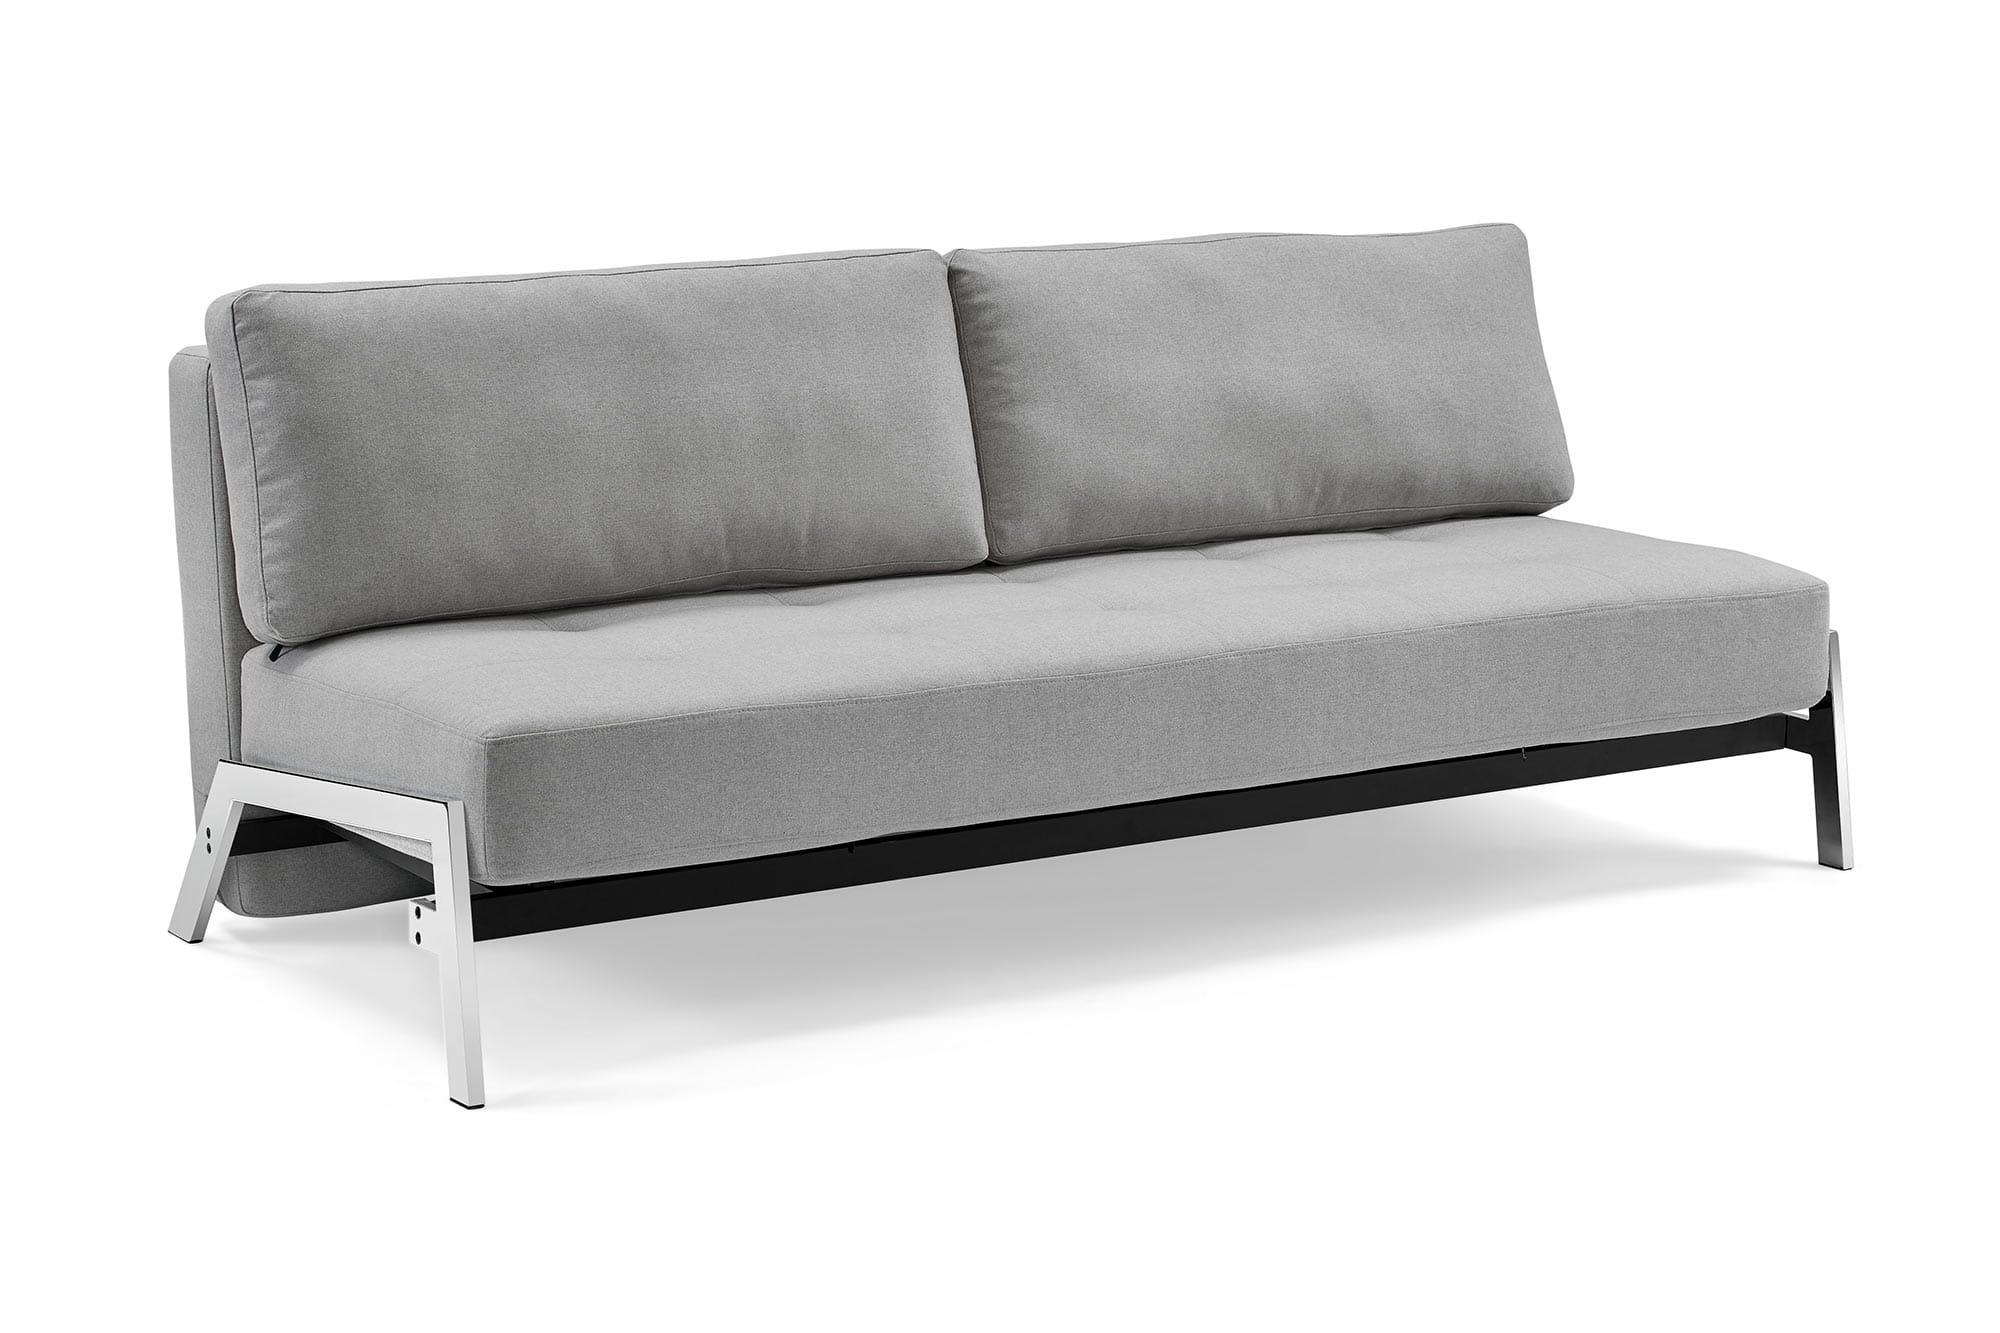 Borolo Madrid Gray Dropback Sofa Convertible By Sealy Convertibles